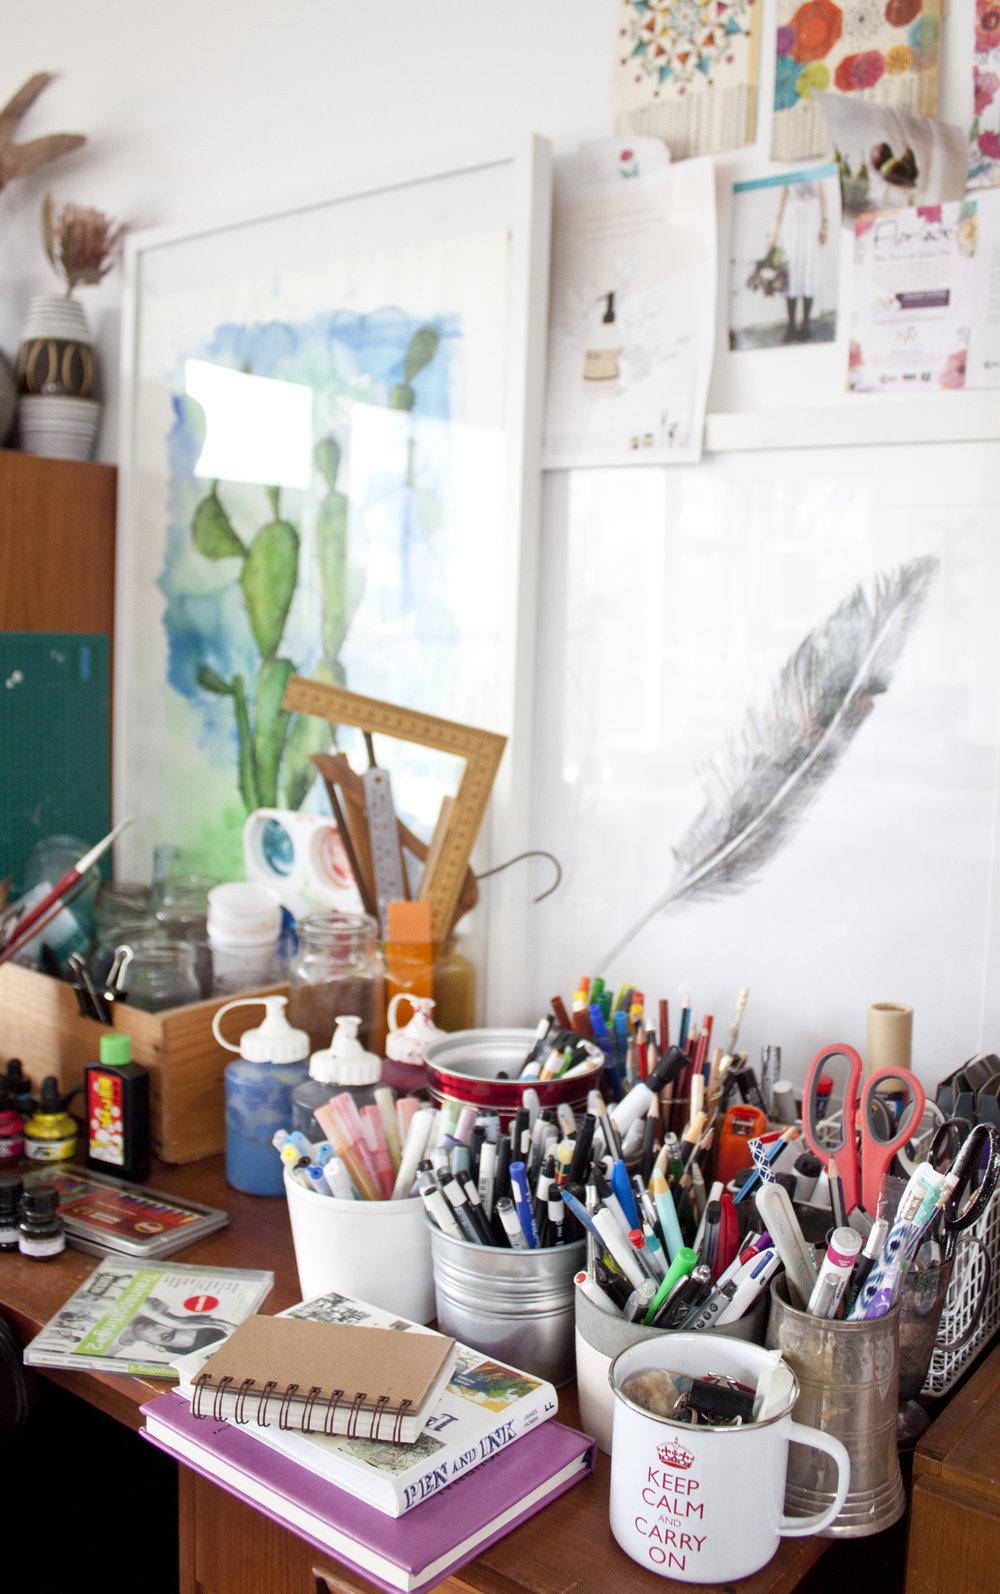 Australian artist studio visit Shani Nottingham - The Corner Store Gallery